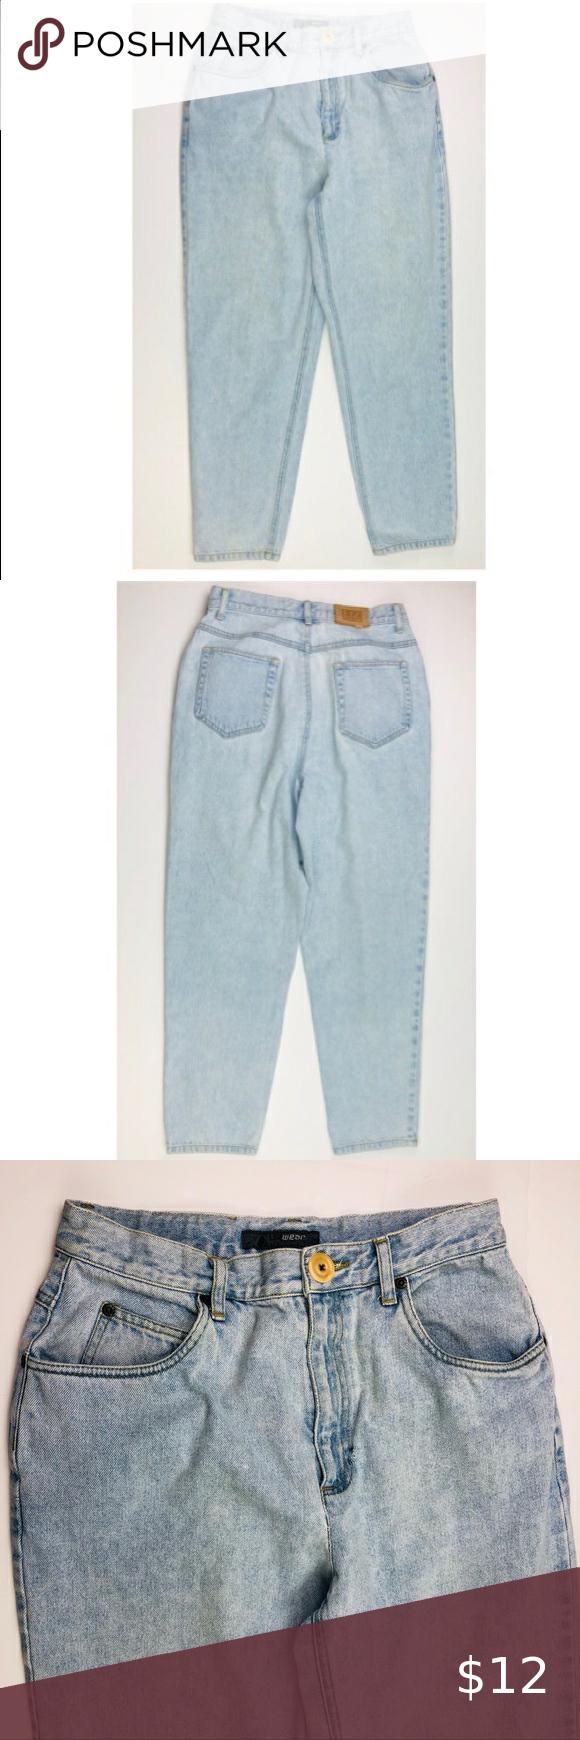 Liz Wear Petite Light Blue Denim Jeans High Waist Light Blue Denim High Waist Jeans Blue Denim Jeans